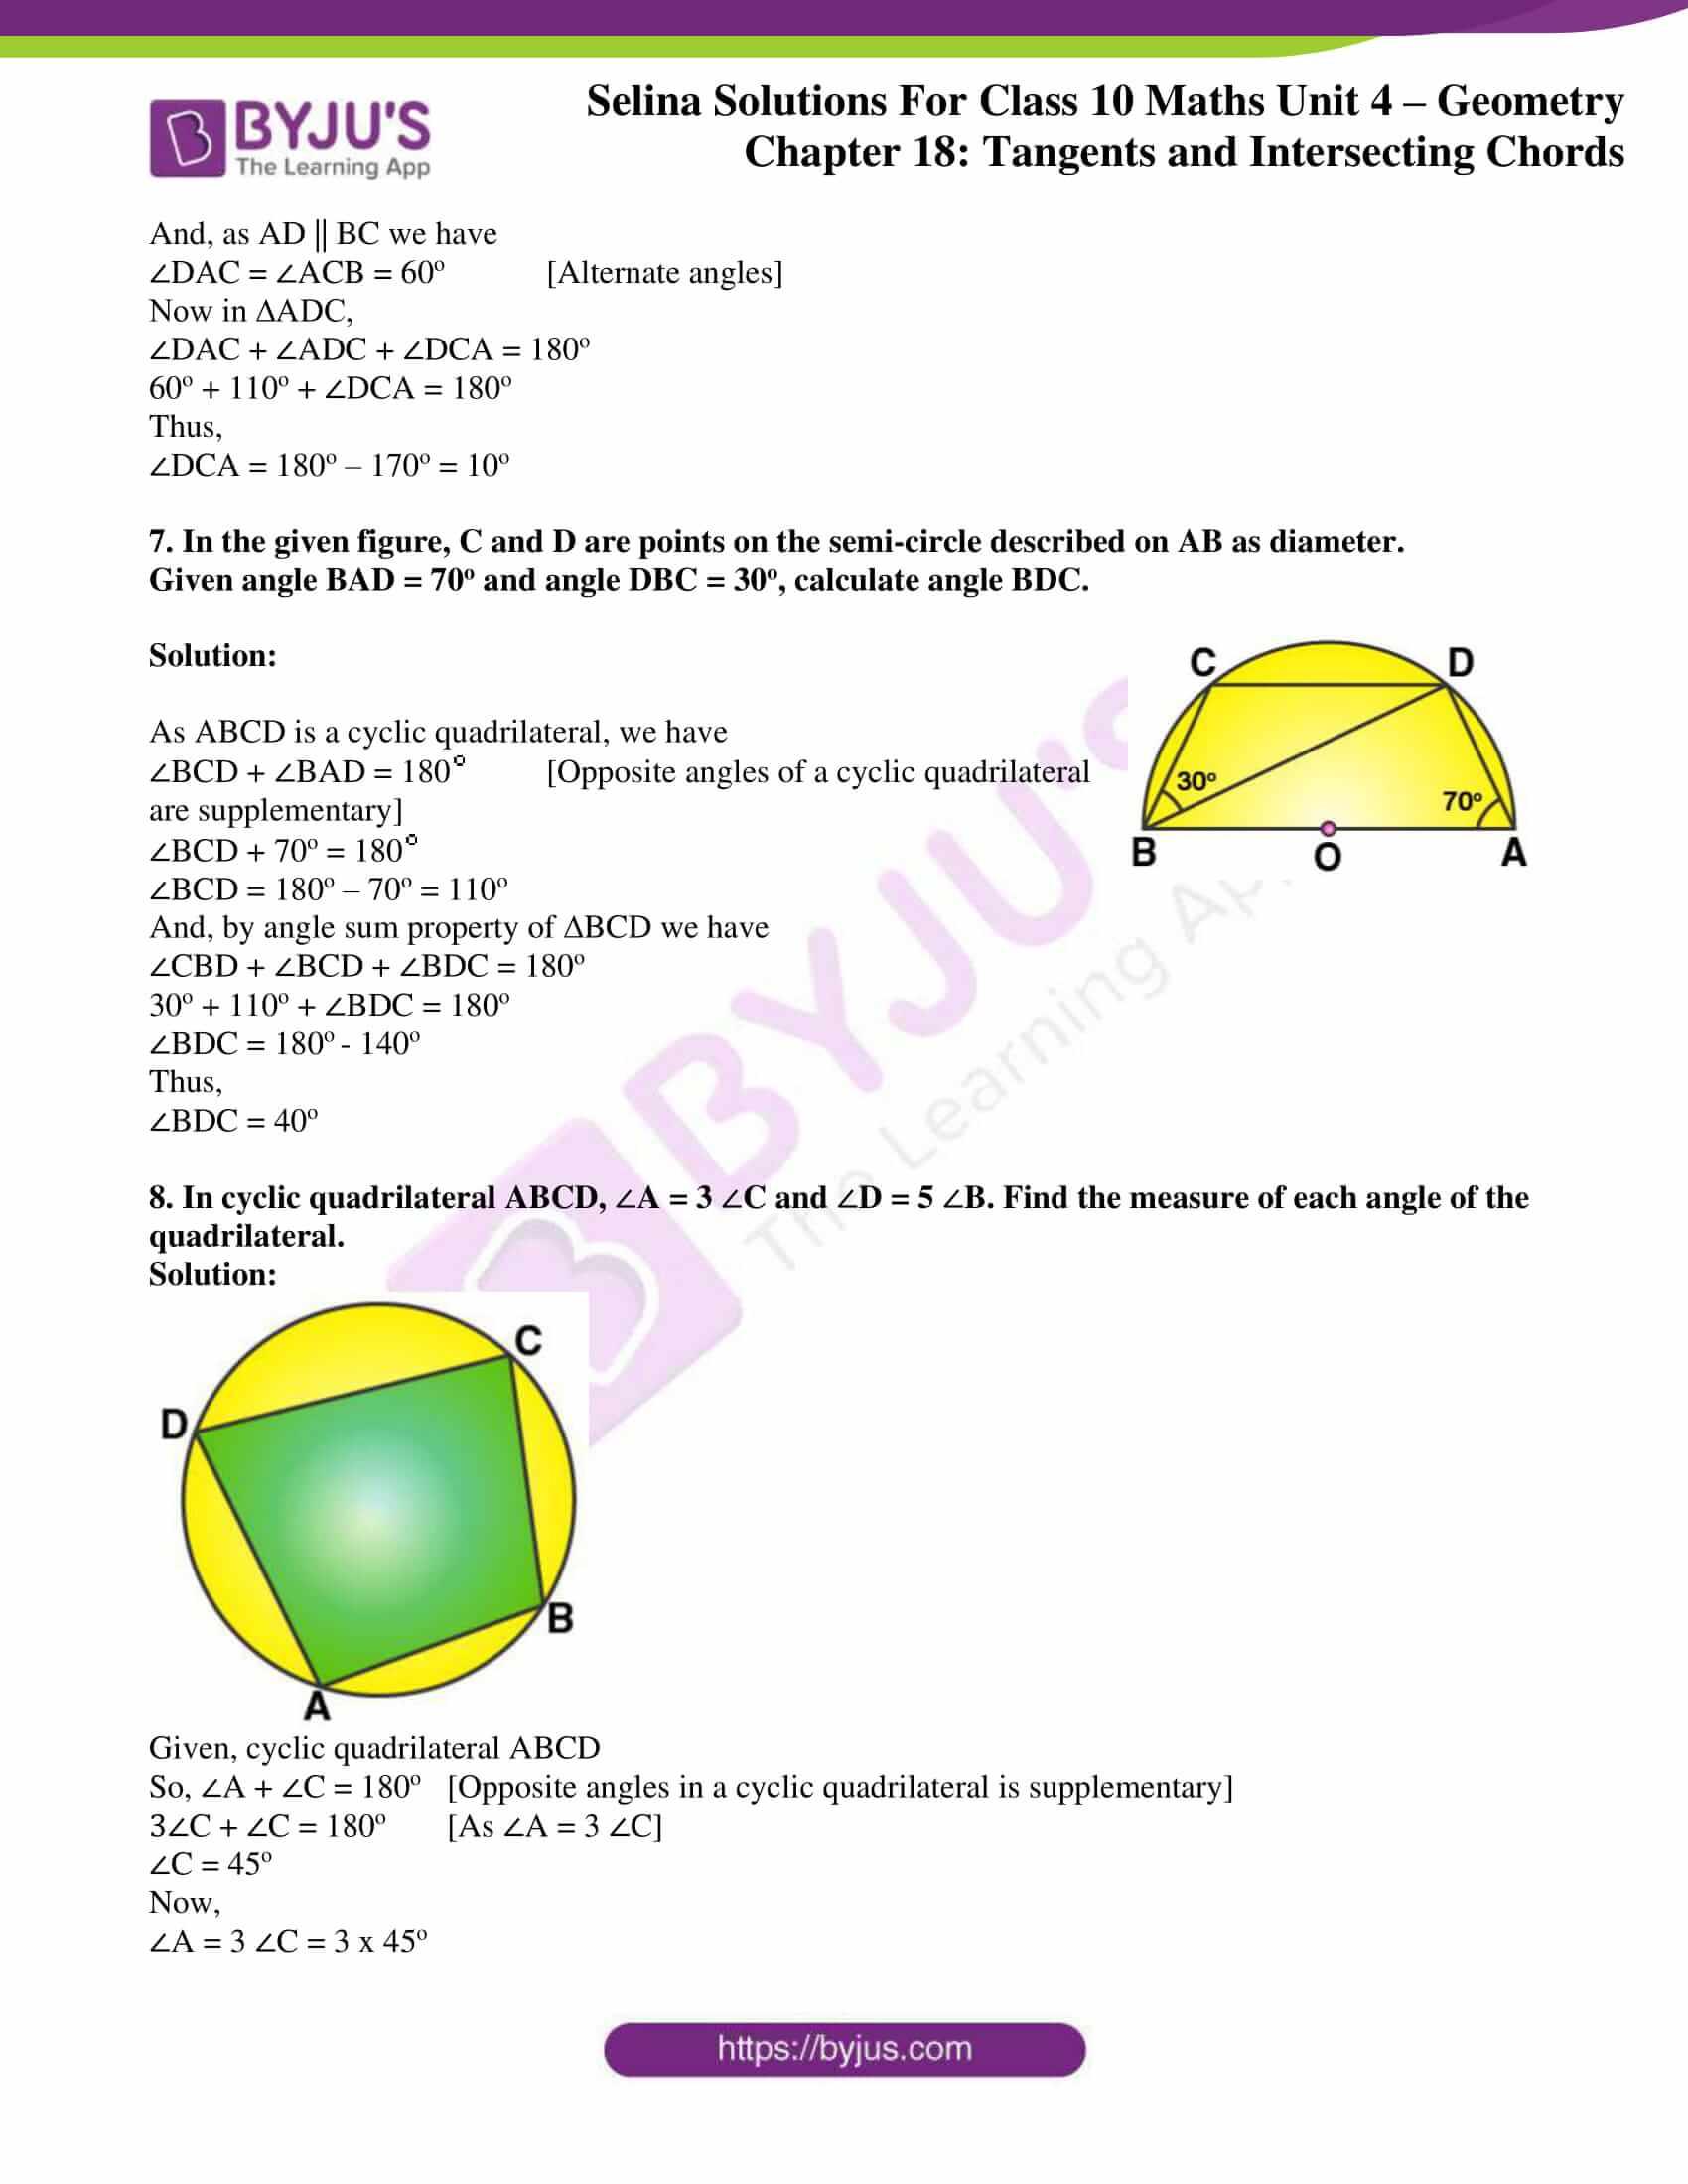 selina-sol-maths-class-10-ch-18-ex-c-04